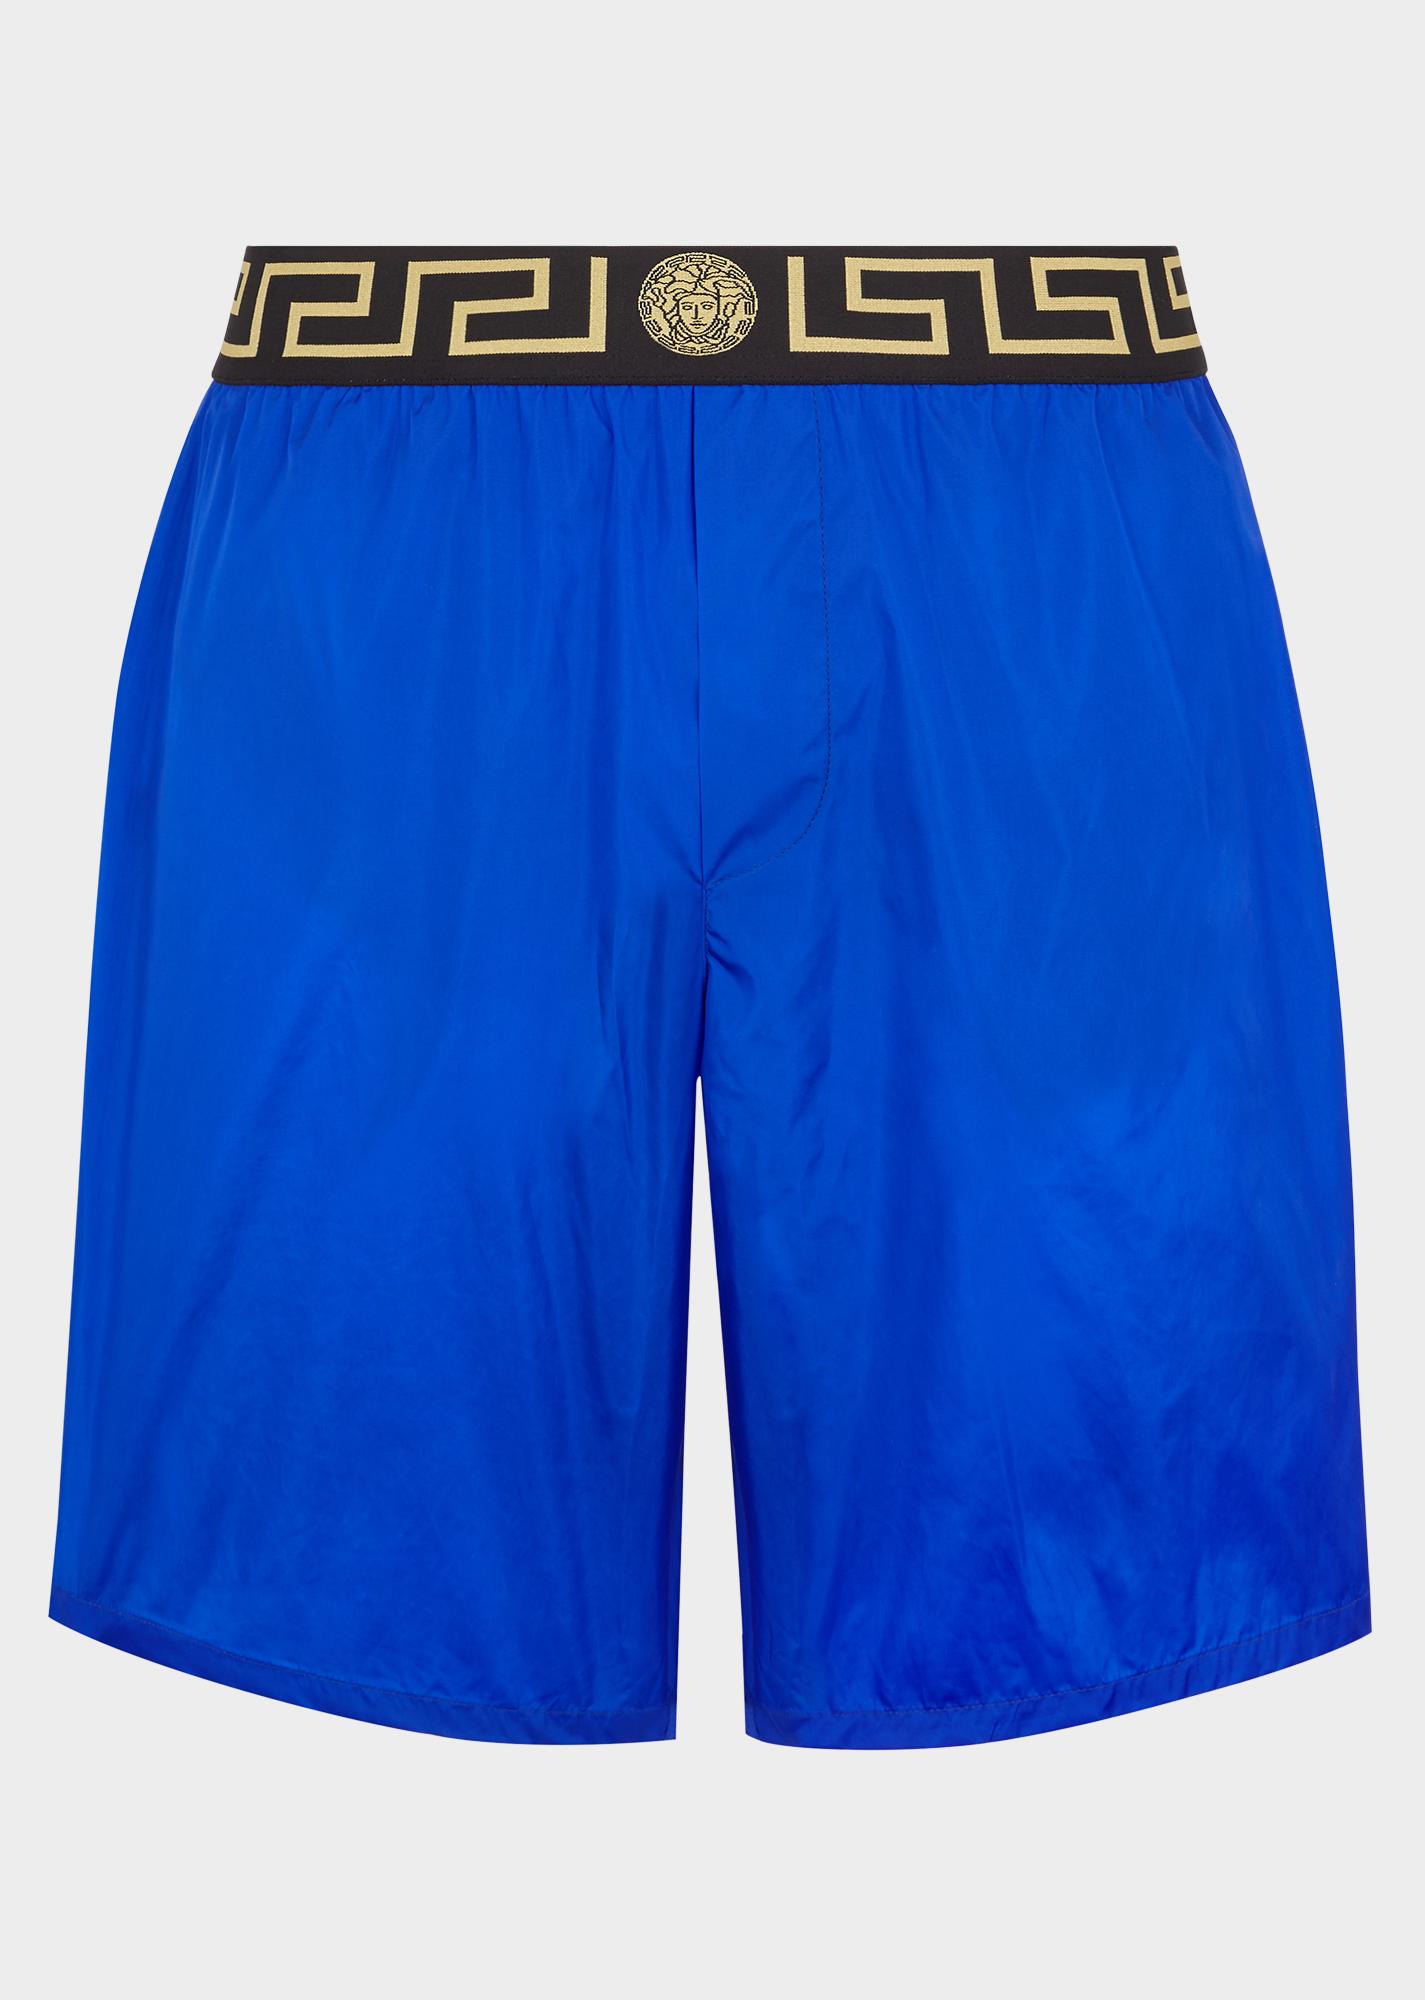 4ea1e711da Medusa And Greek Key Swim Shorts in Blue